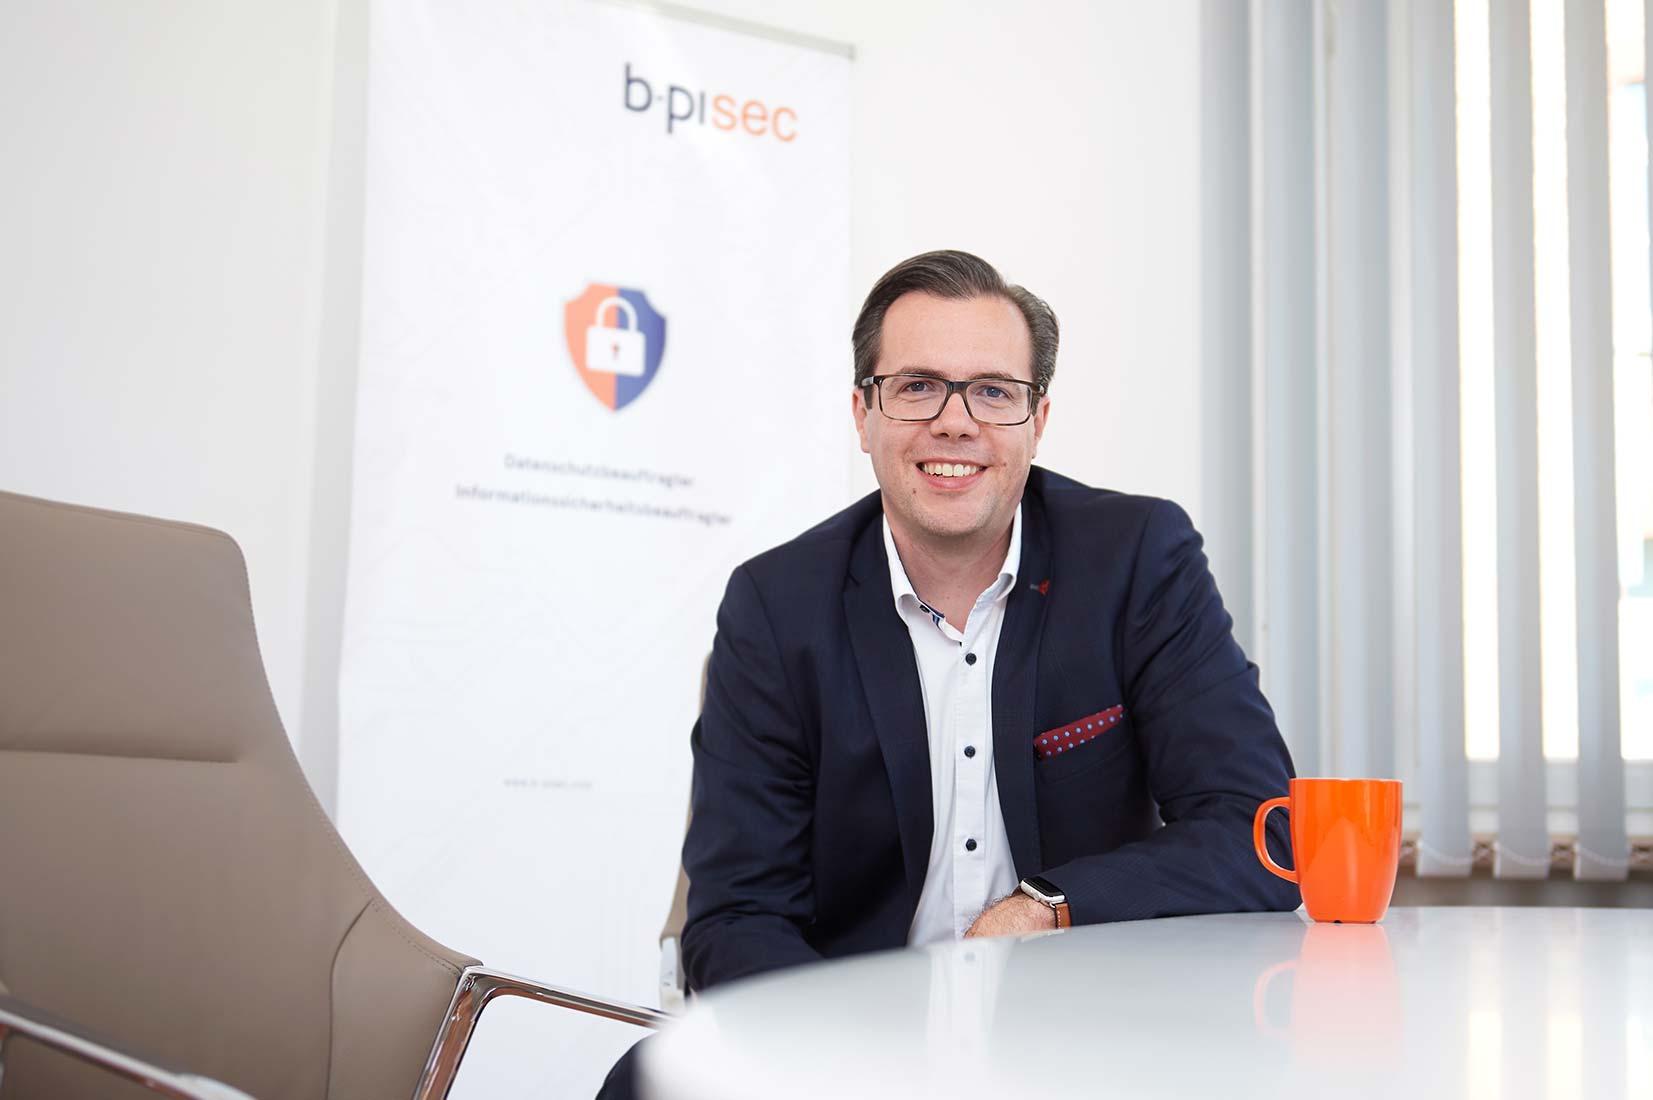 Corporate Portraitfoto Geschäftsführung b-pisec GmbH in Limburg